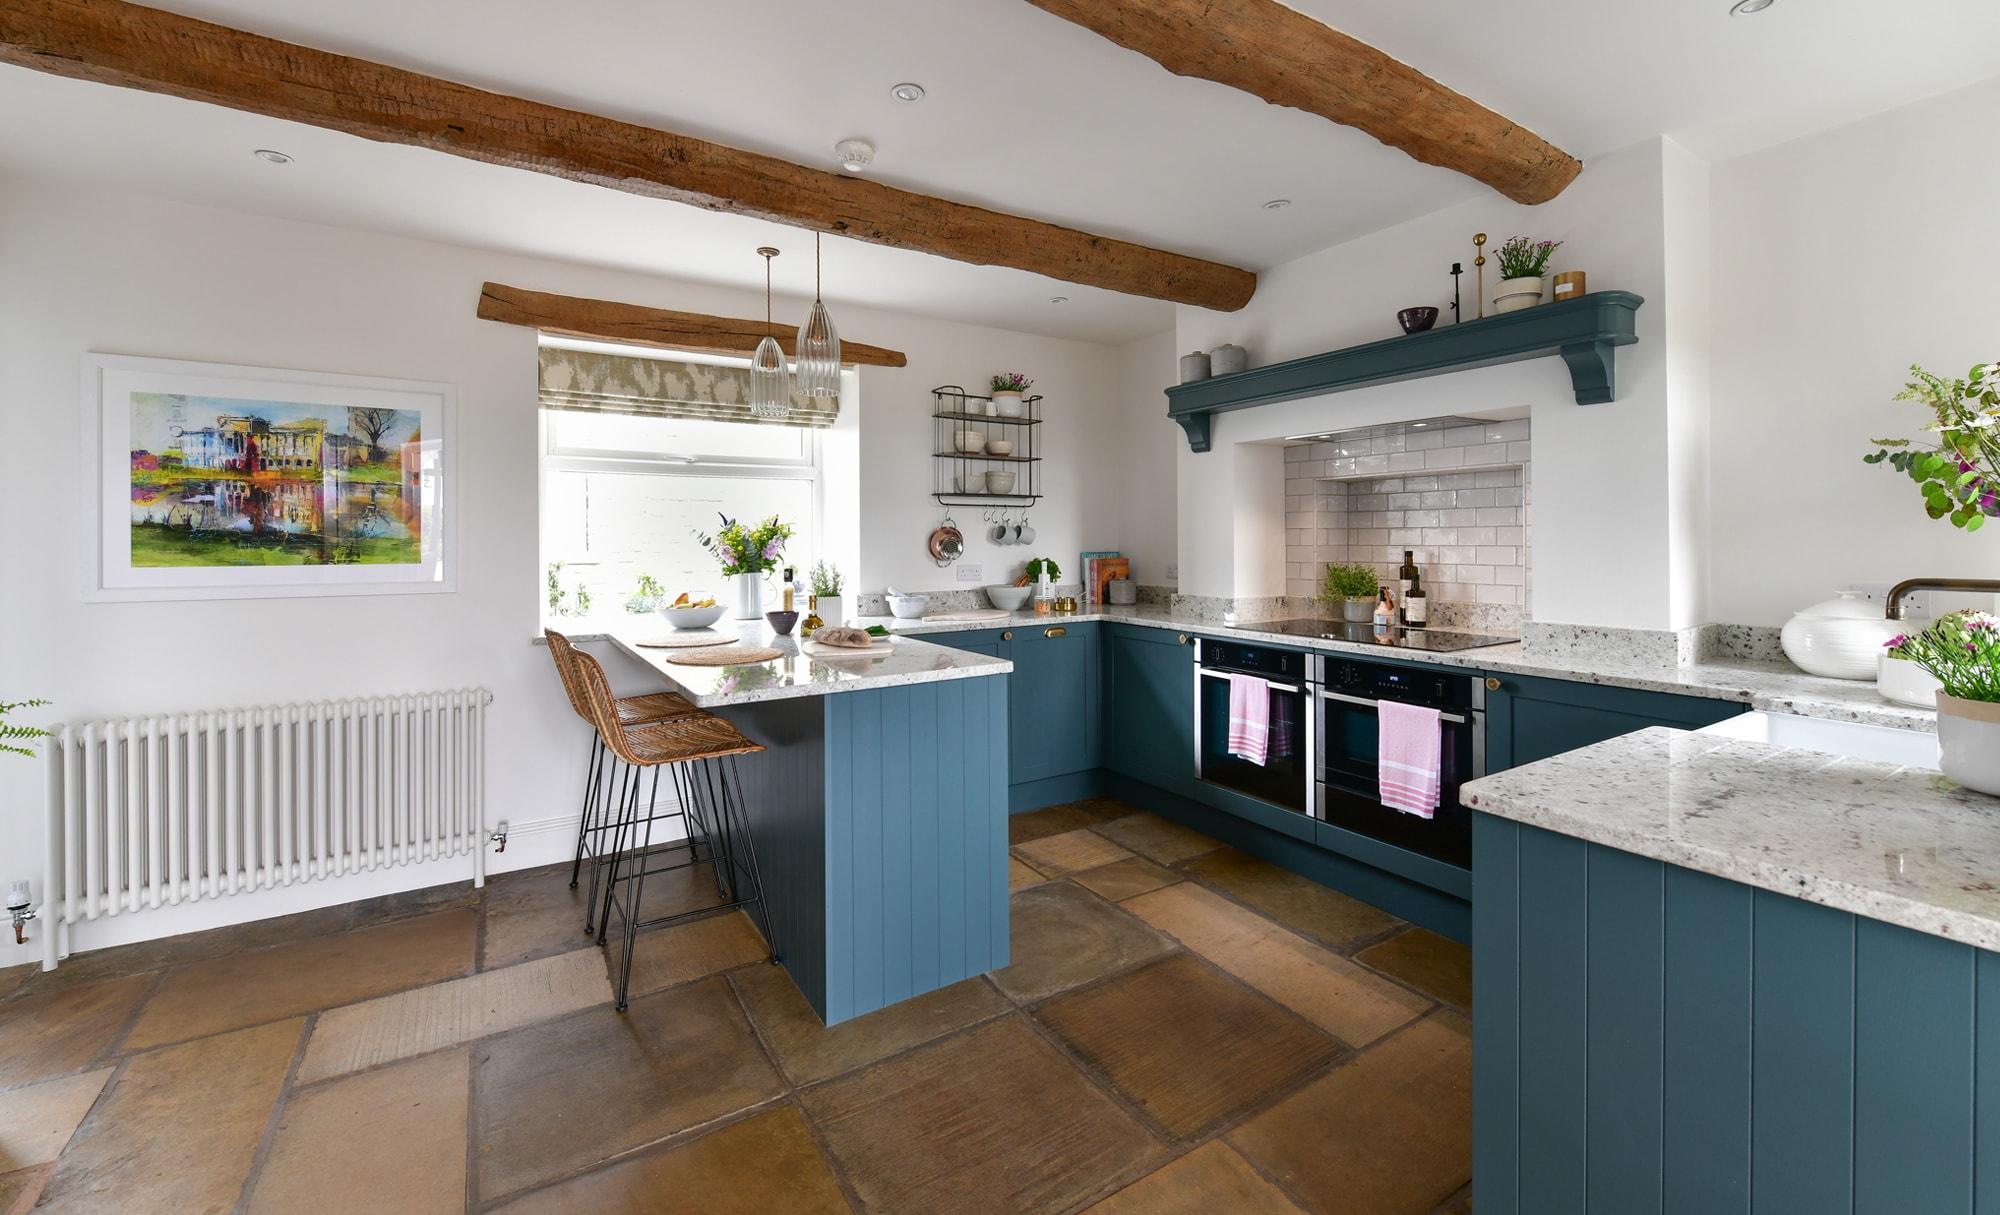 Richard & Richards Aldana Viridian Kitchen for Alan & Jane of Southcott